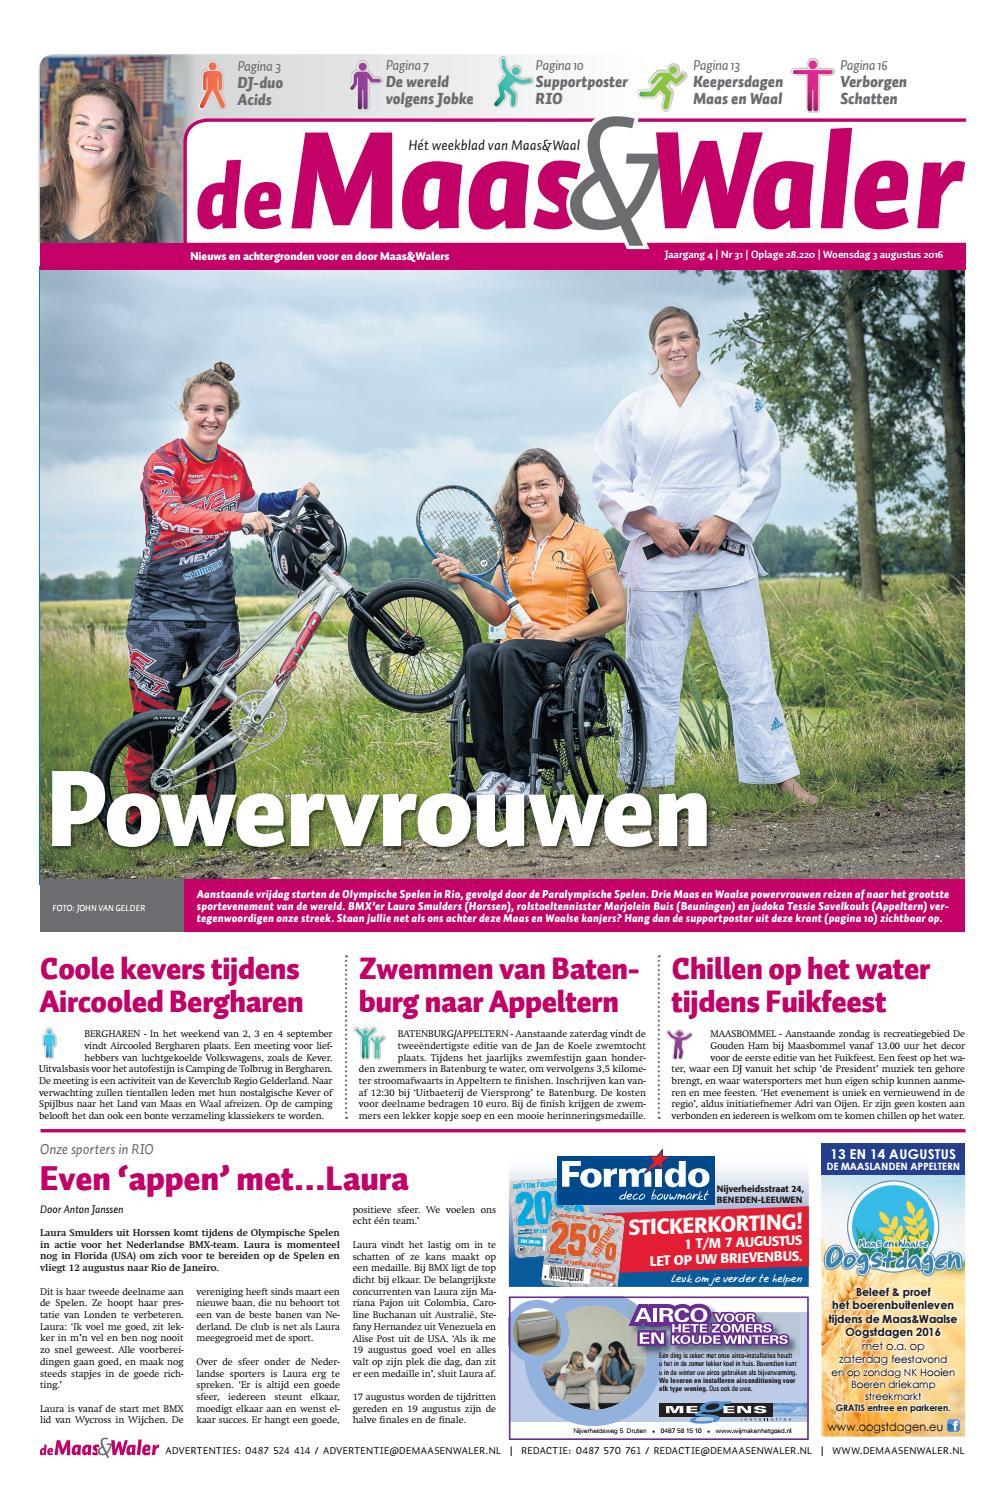 2e0771932103 De Maas Waler week 31 2016 by de Maas Waler - issuu